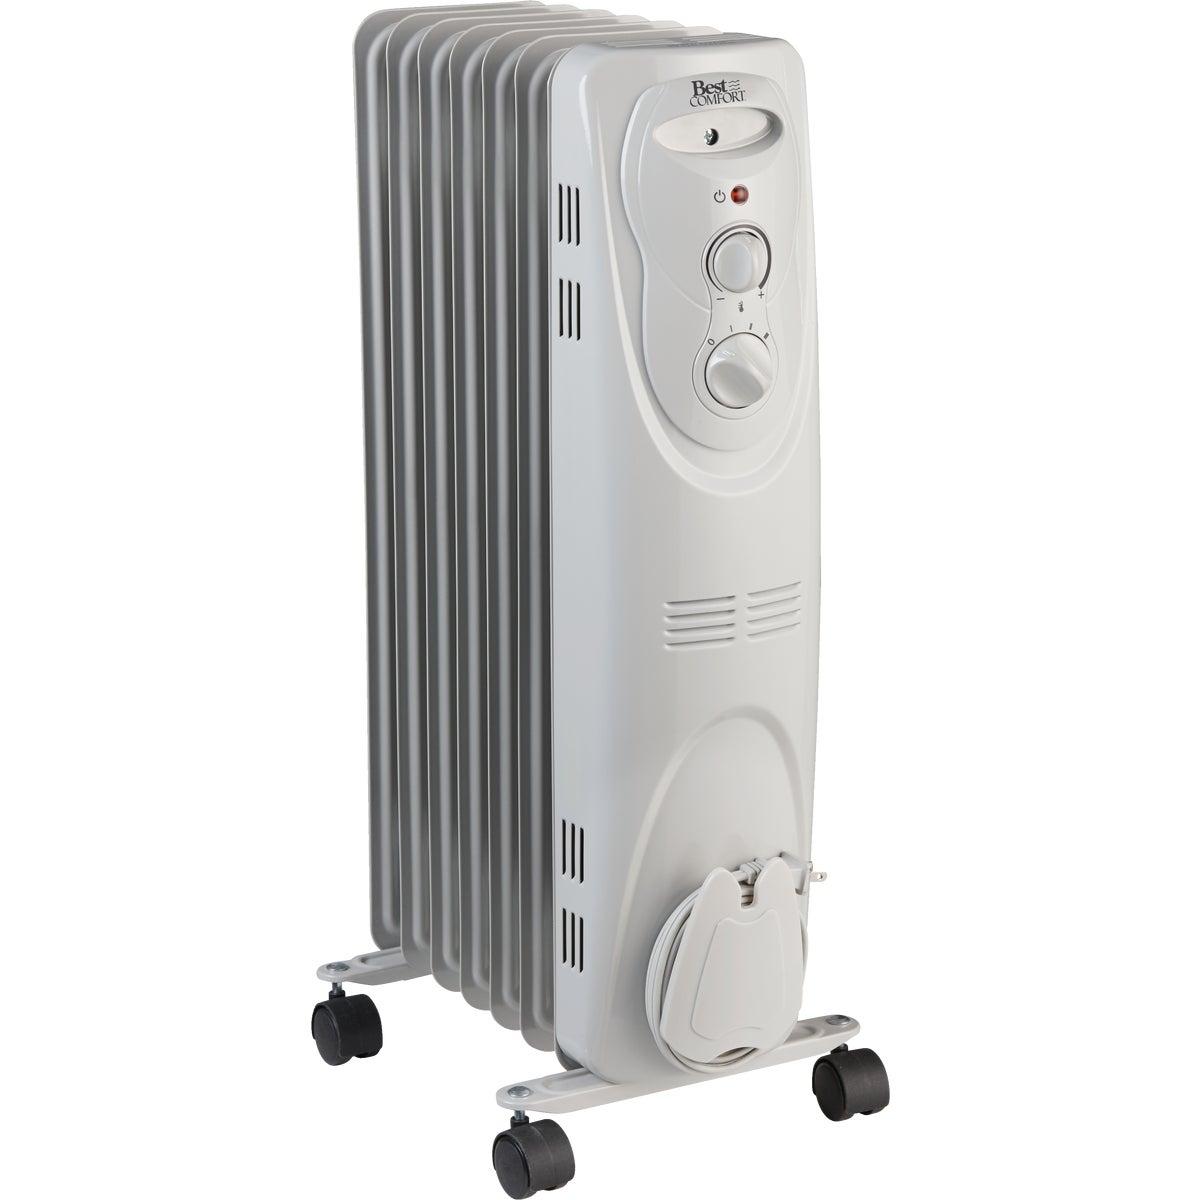 Seasons Comfort Oil Filled Radiator Heater